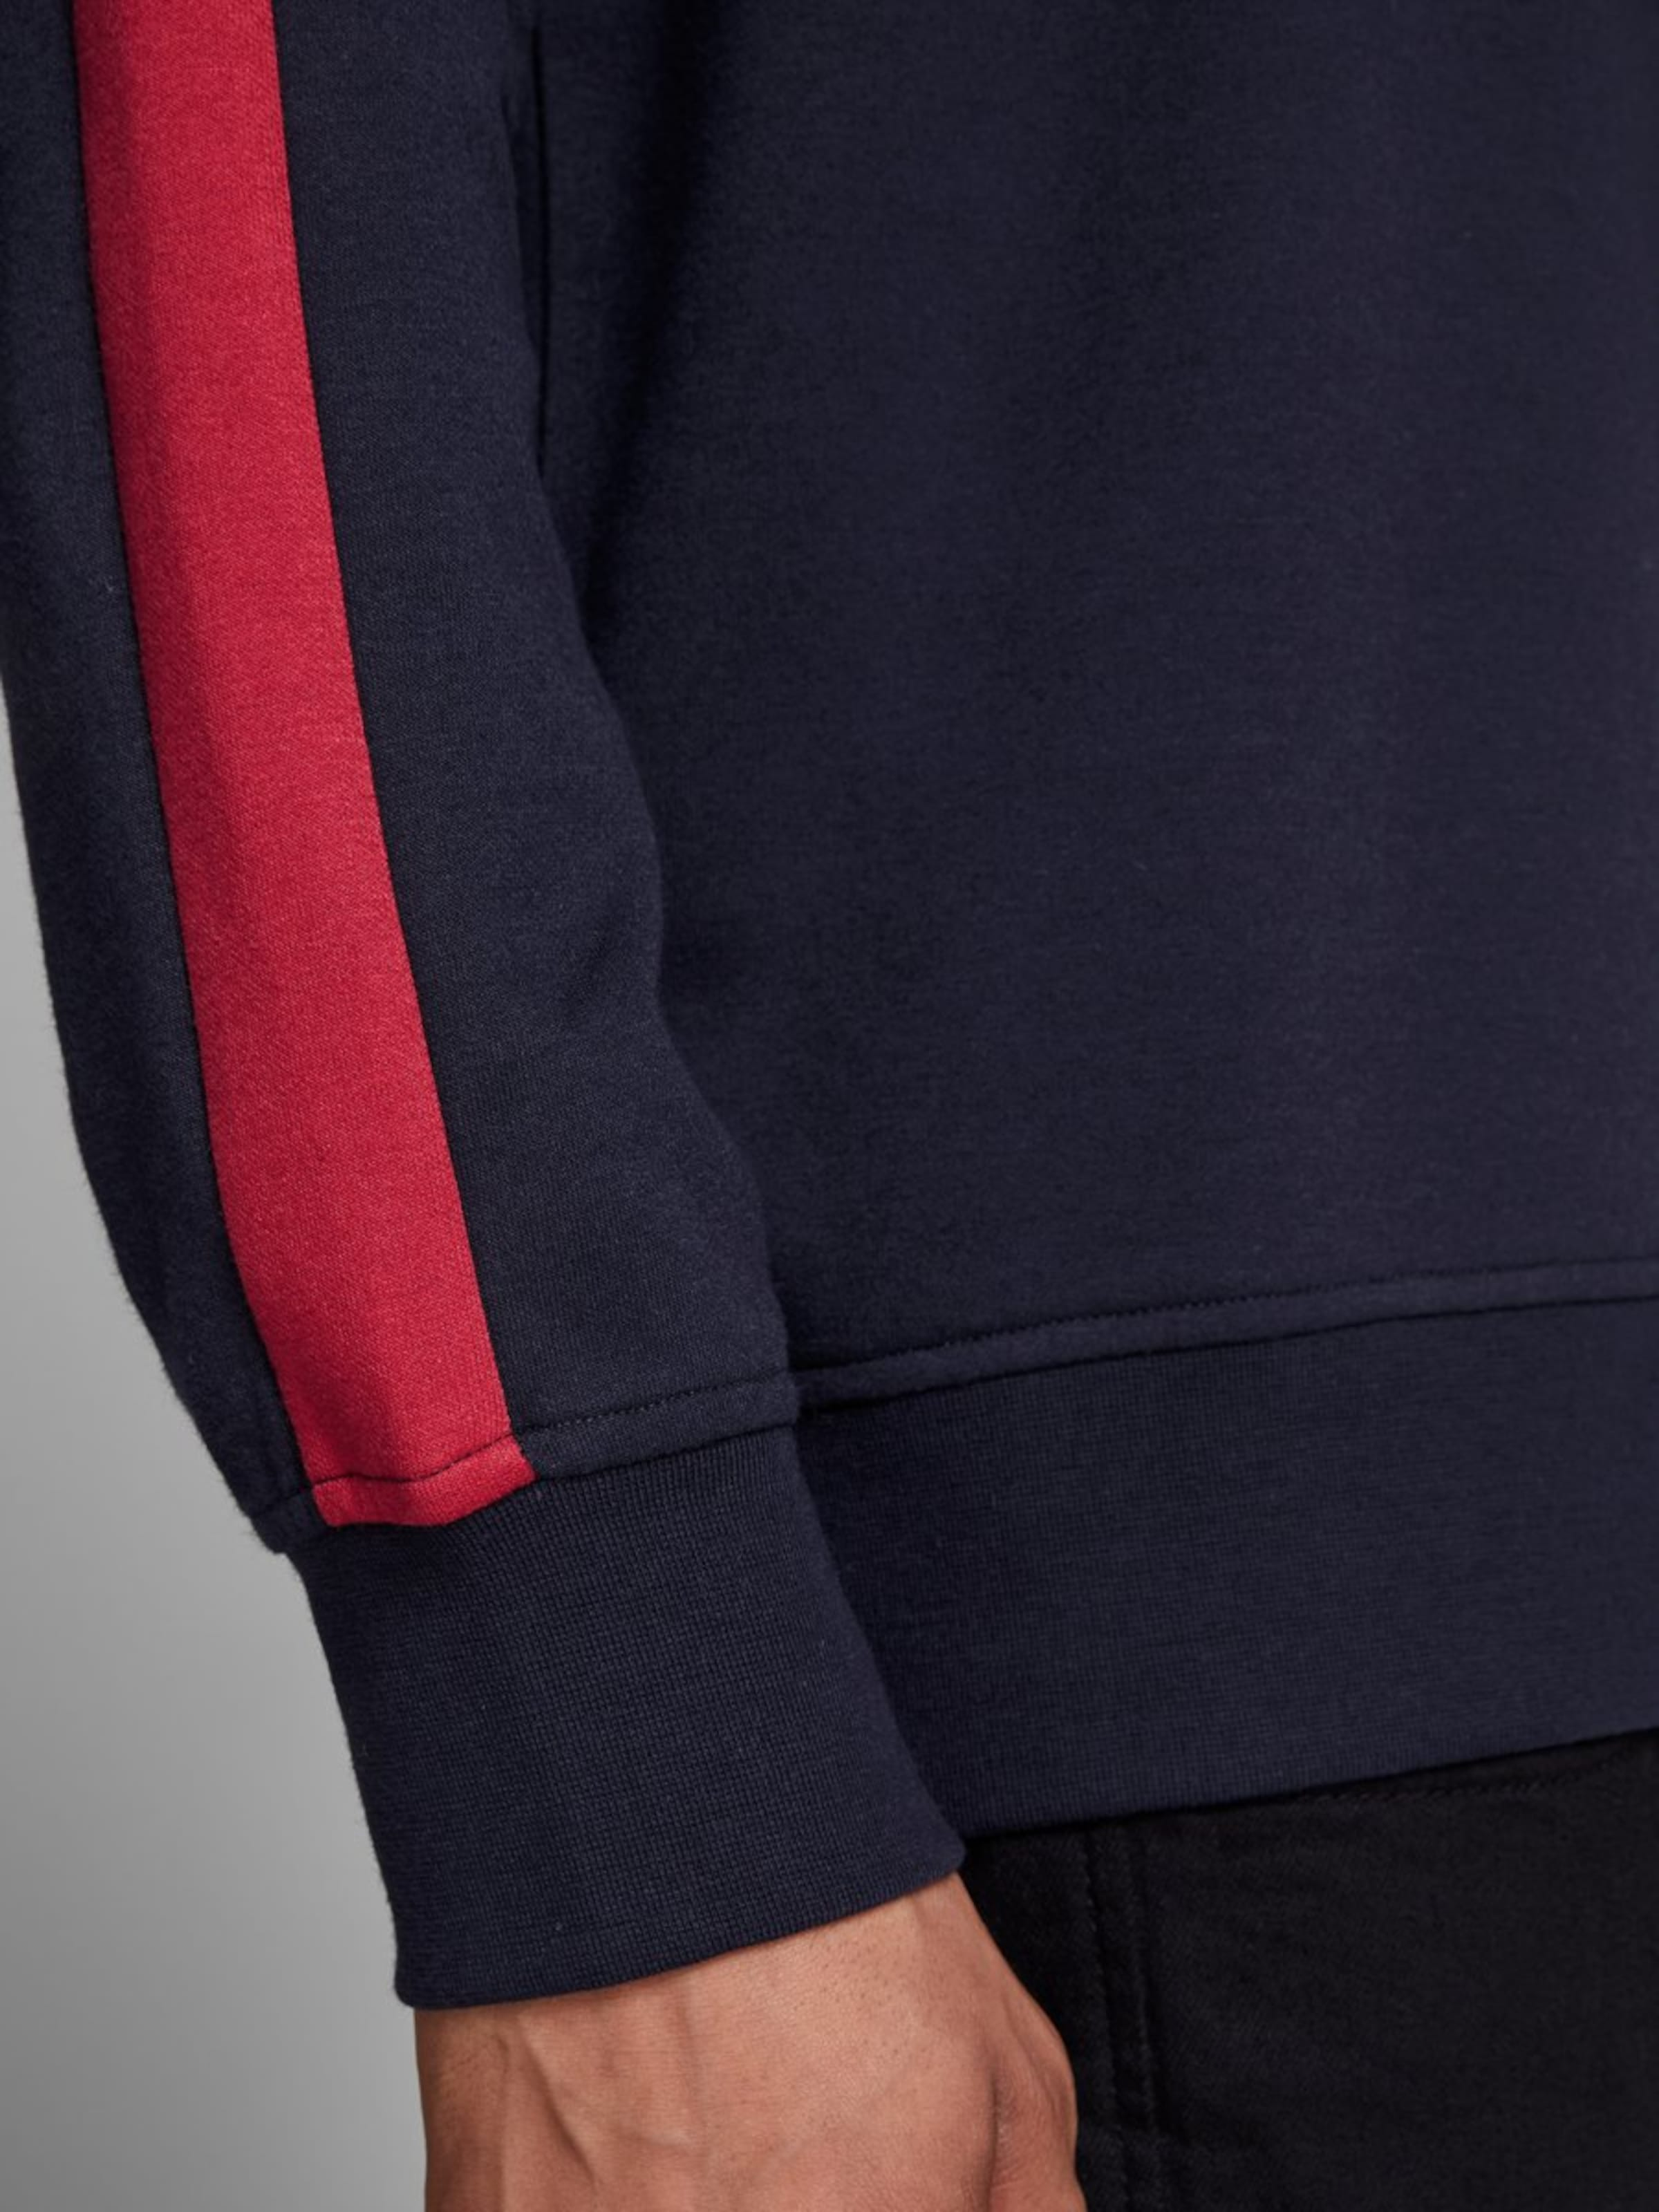 Jones Jackamp; shirt Bleu 'stempel' En Sweat MarineRouge Blanc 5AR34jL